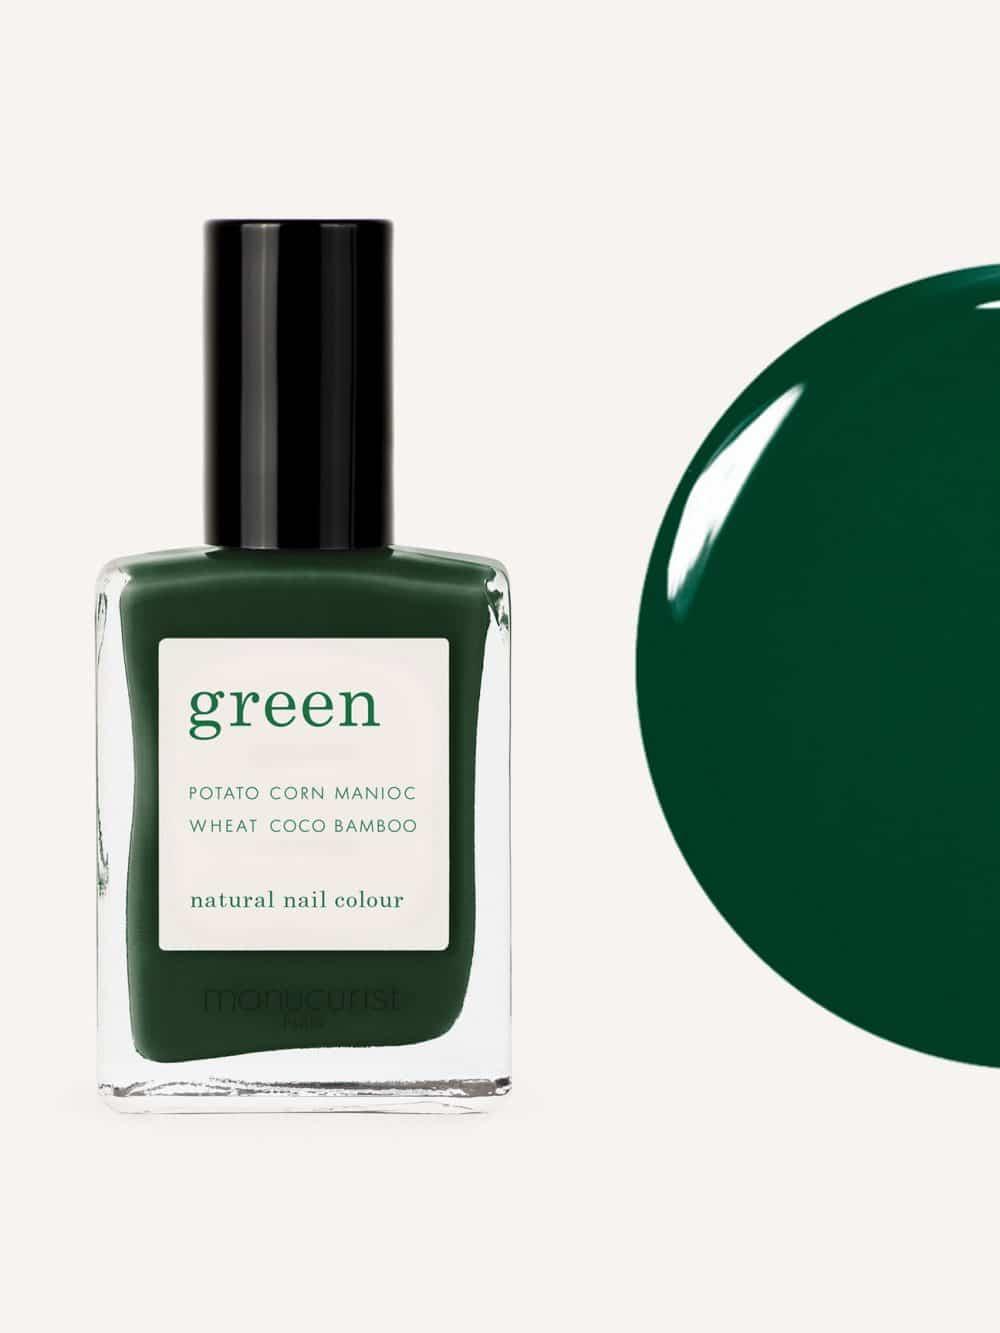 vernis à ongles bio green de la marque Manucurist made in france de couleur vert emerald